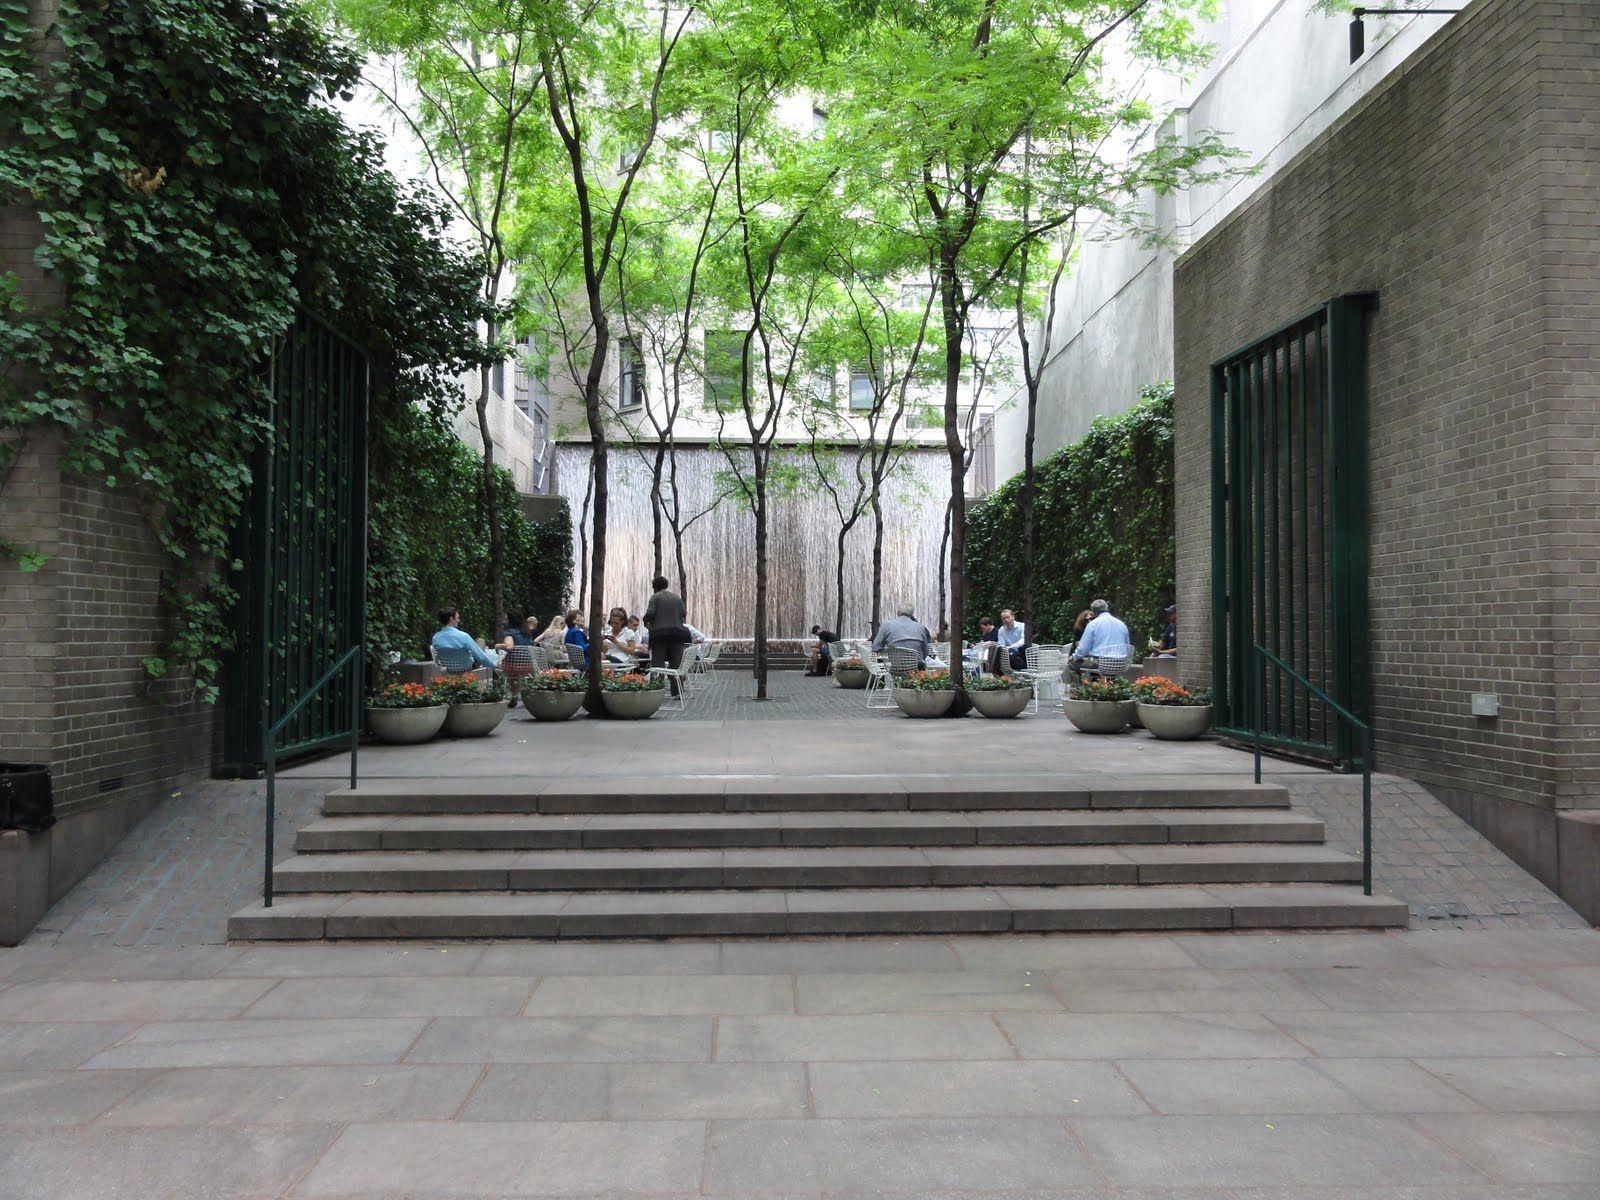 Paley park pocket park landscape design exterior pinterest architects pocket park and - Small urban spaces image ...